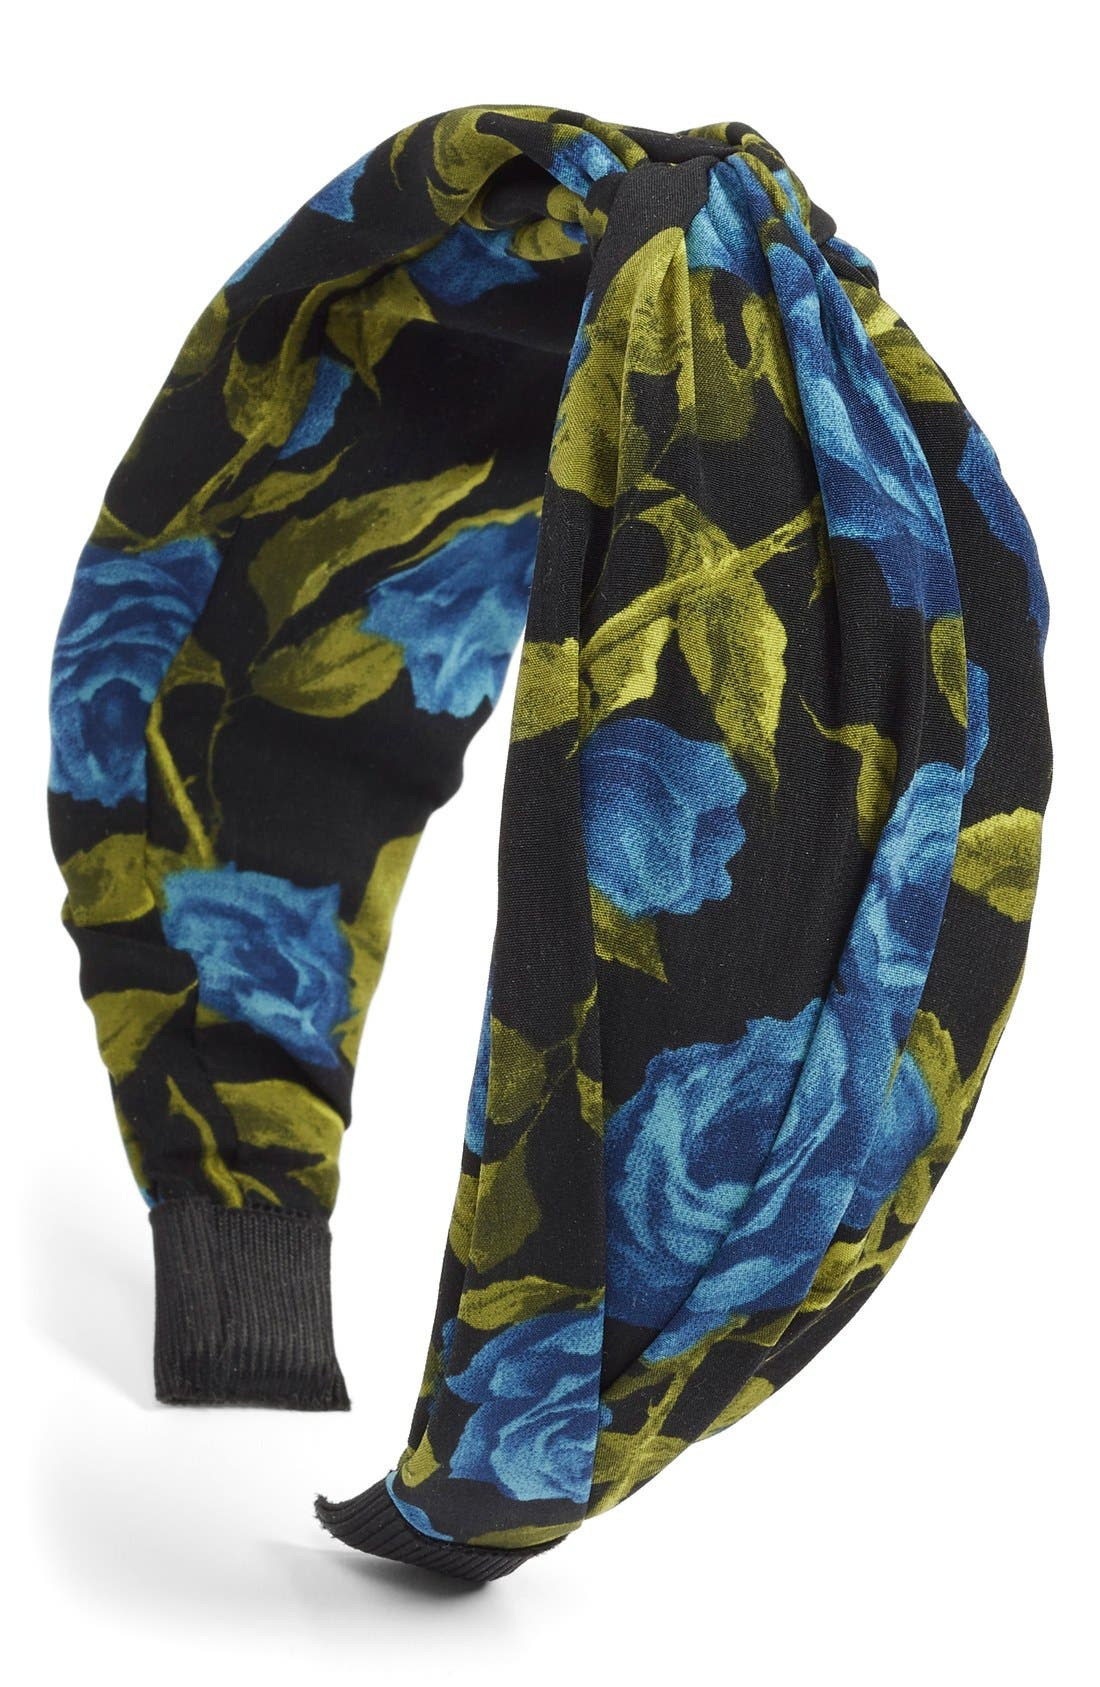 Rose Print Twist Knot Headband,                             Main thumbnail 1, color,                             Black Multi